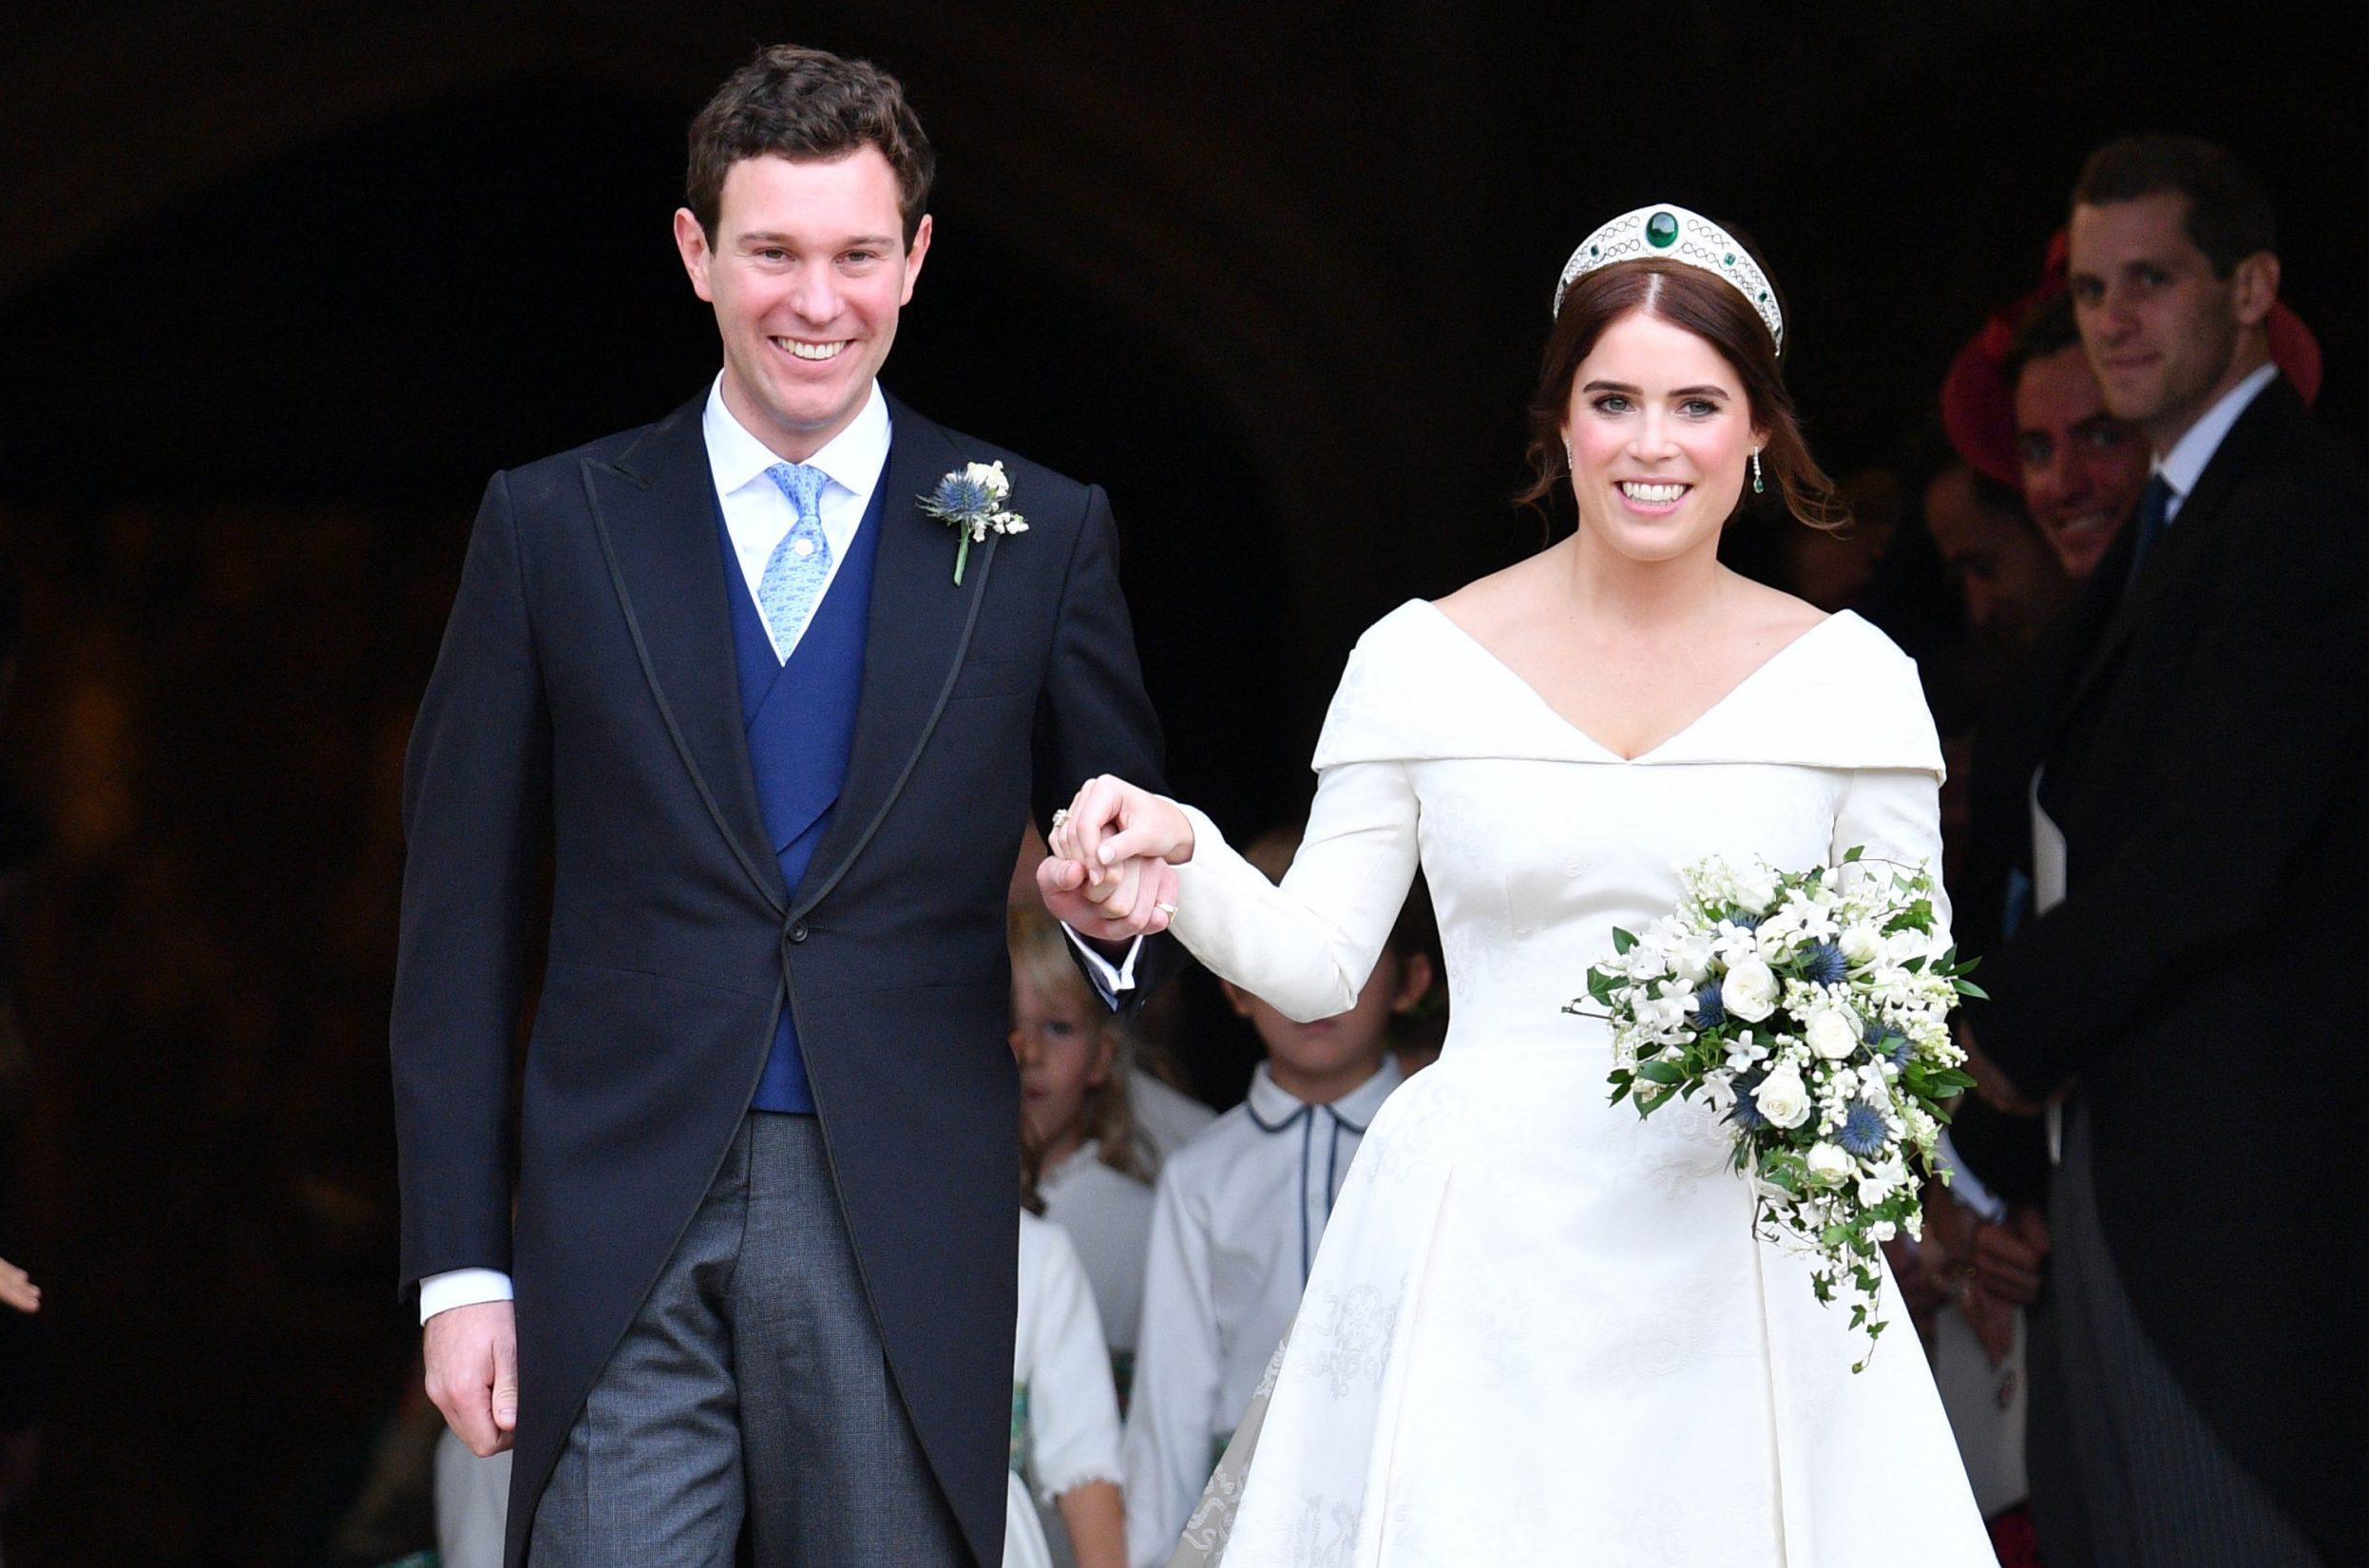 Mandatory Credit: Photo by Tim Rooke/REX (9927759i) Jack Brooksbank and Princess Eugenie The wedding of Princess Eugenie and Jack Brooksbank, Carriage Procession, Windsor, Berkshire, UK - 12 Oct 2018